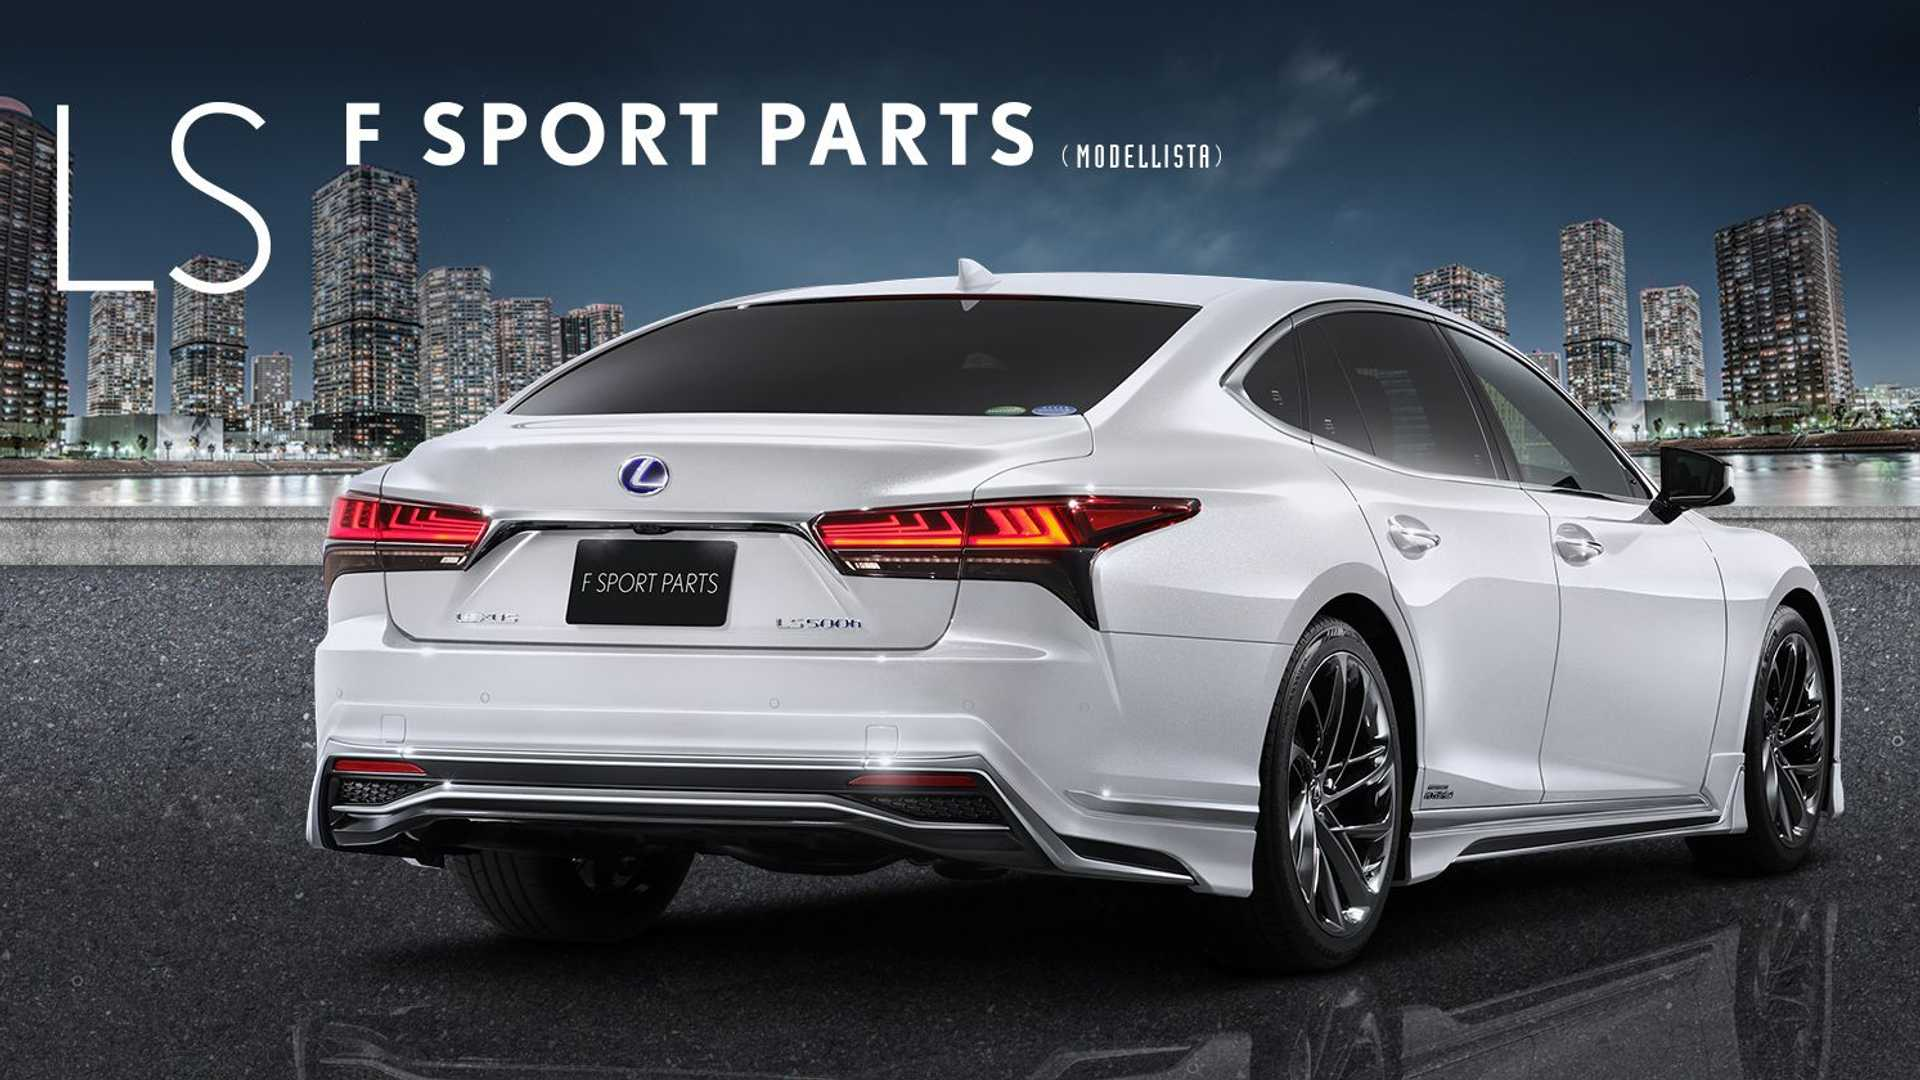 Lexus-LS-F-Sport-Modellista-1